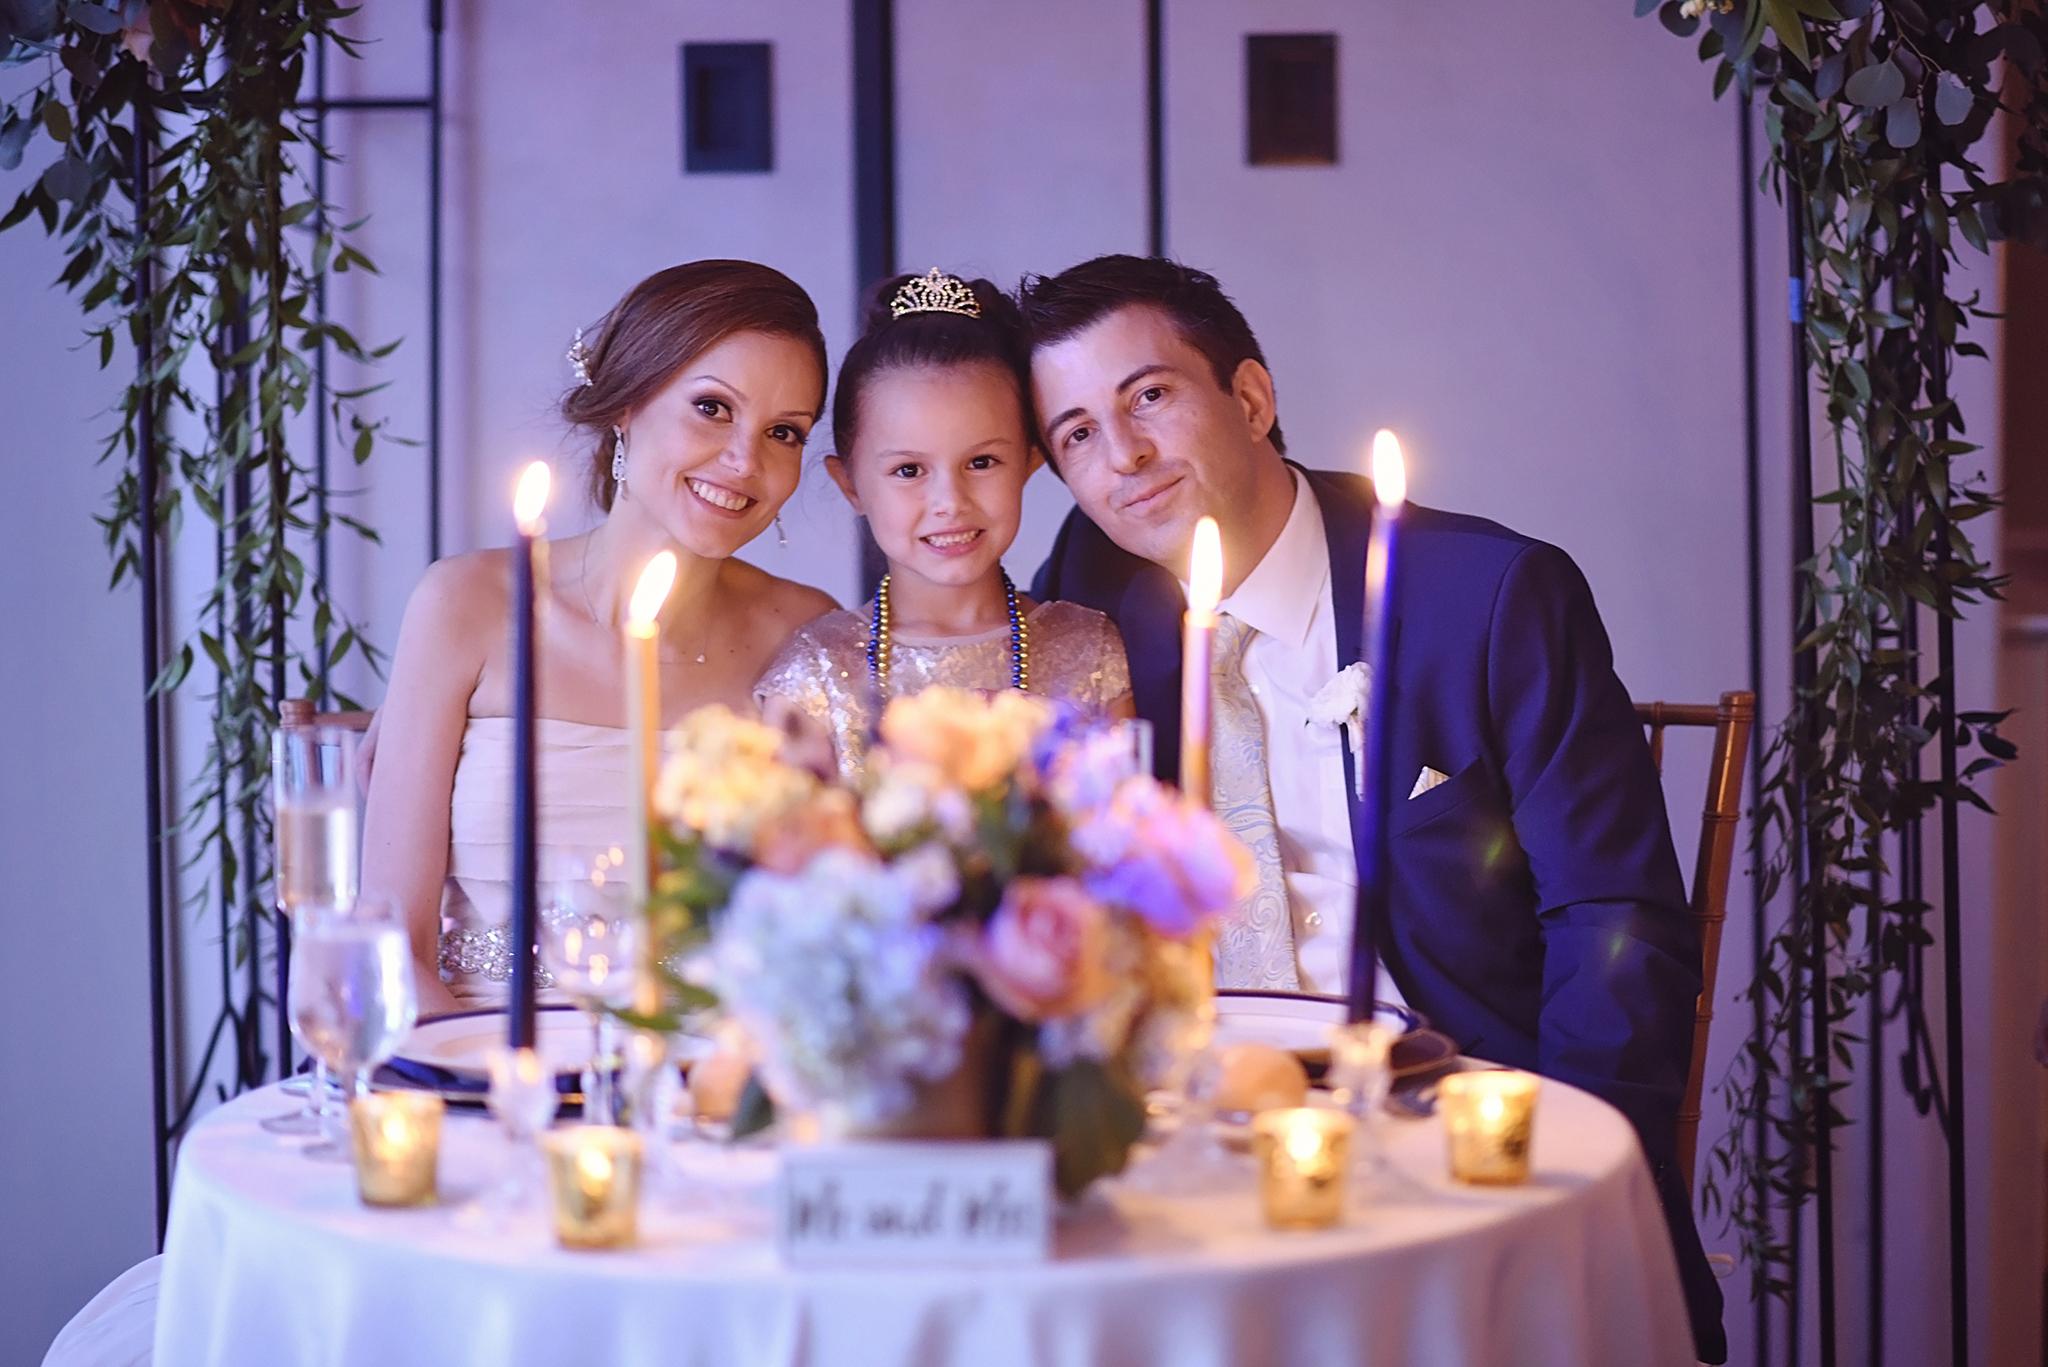 NJ-NY-wedding-photographer-150NJ-NY-wedding-photographer-150NJ-NY-WEDDING-PHOTOGRAPHER-150.JPG